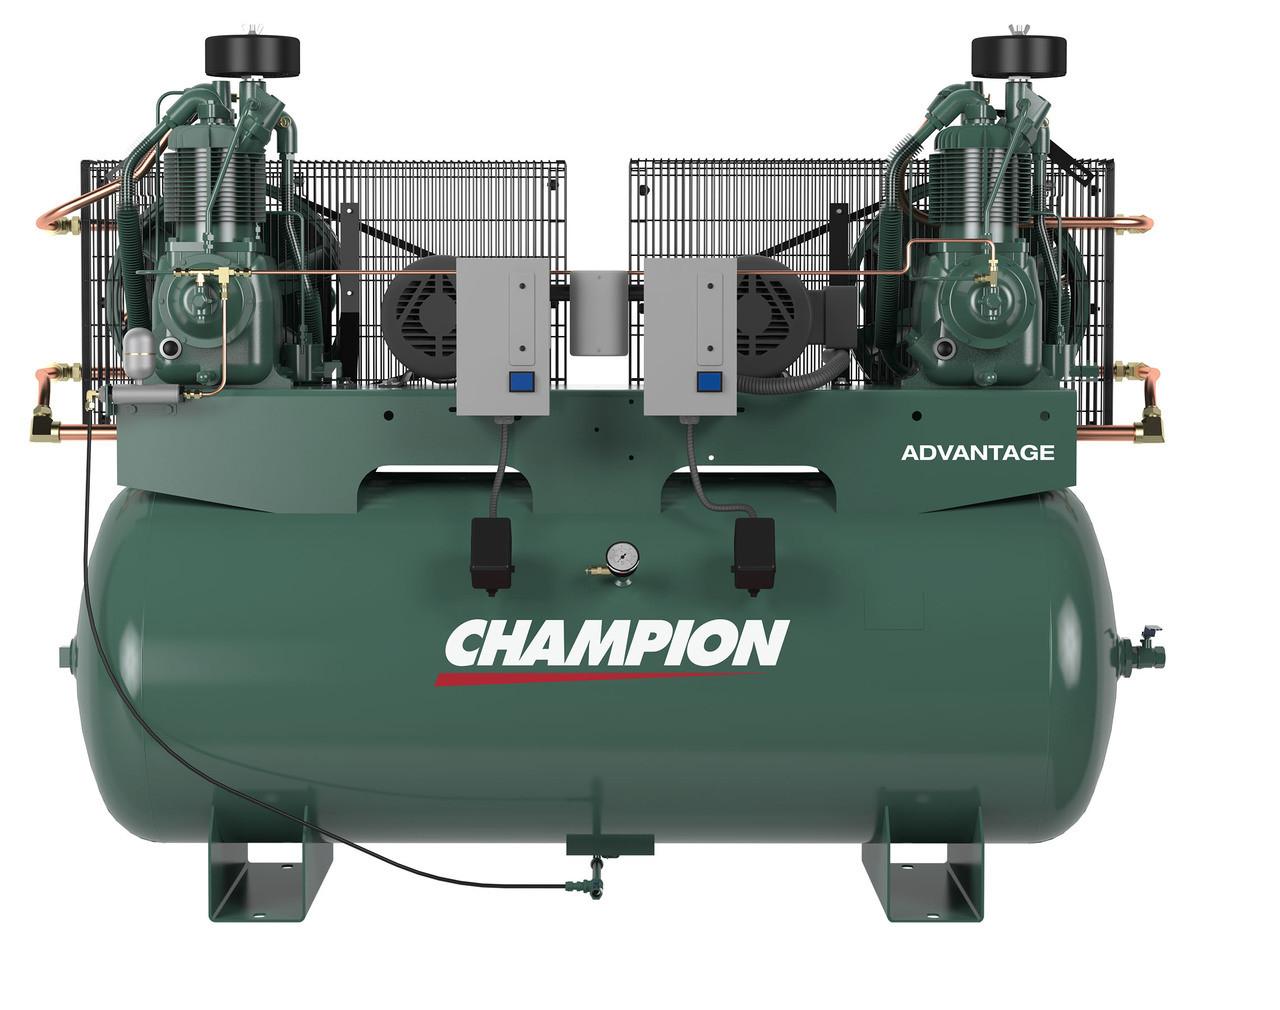 Champion HR5D-12ADV-3 3PH Advantage Series Air Compressor